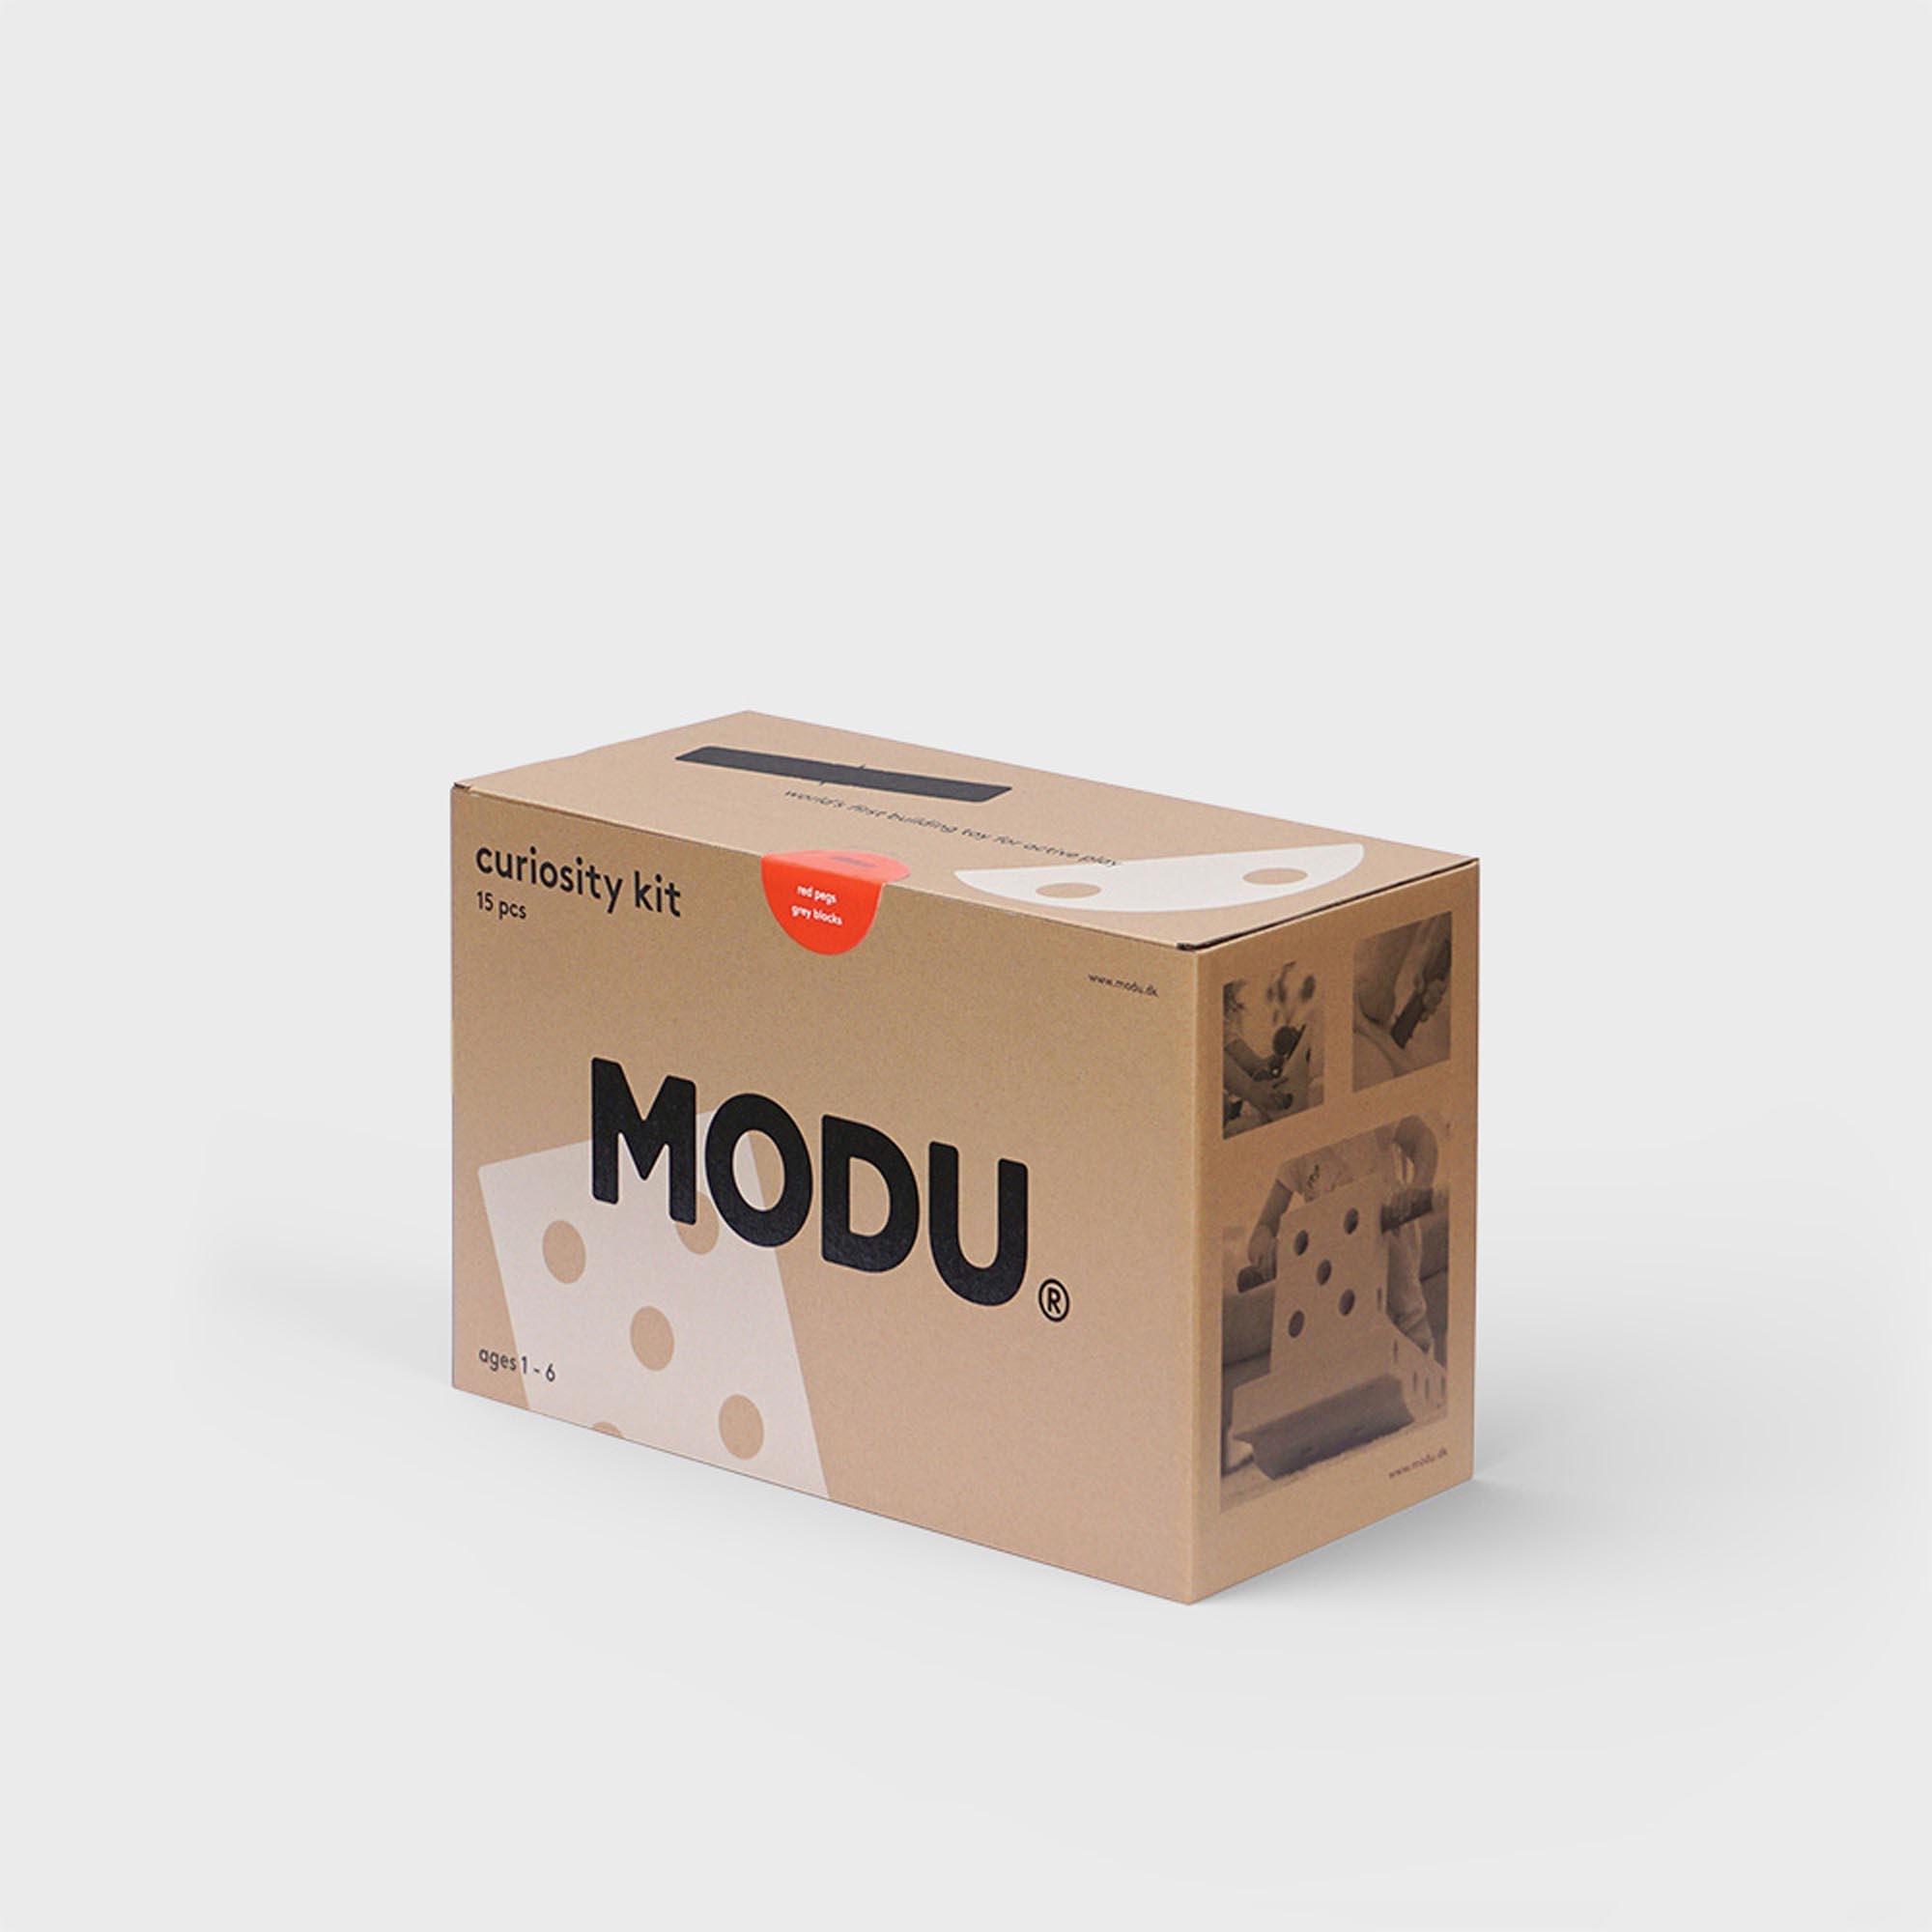 MODU Bouwset - Curiosity Kit Rood